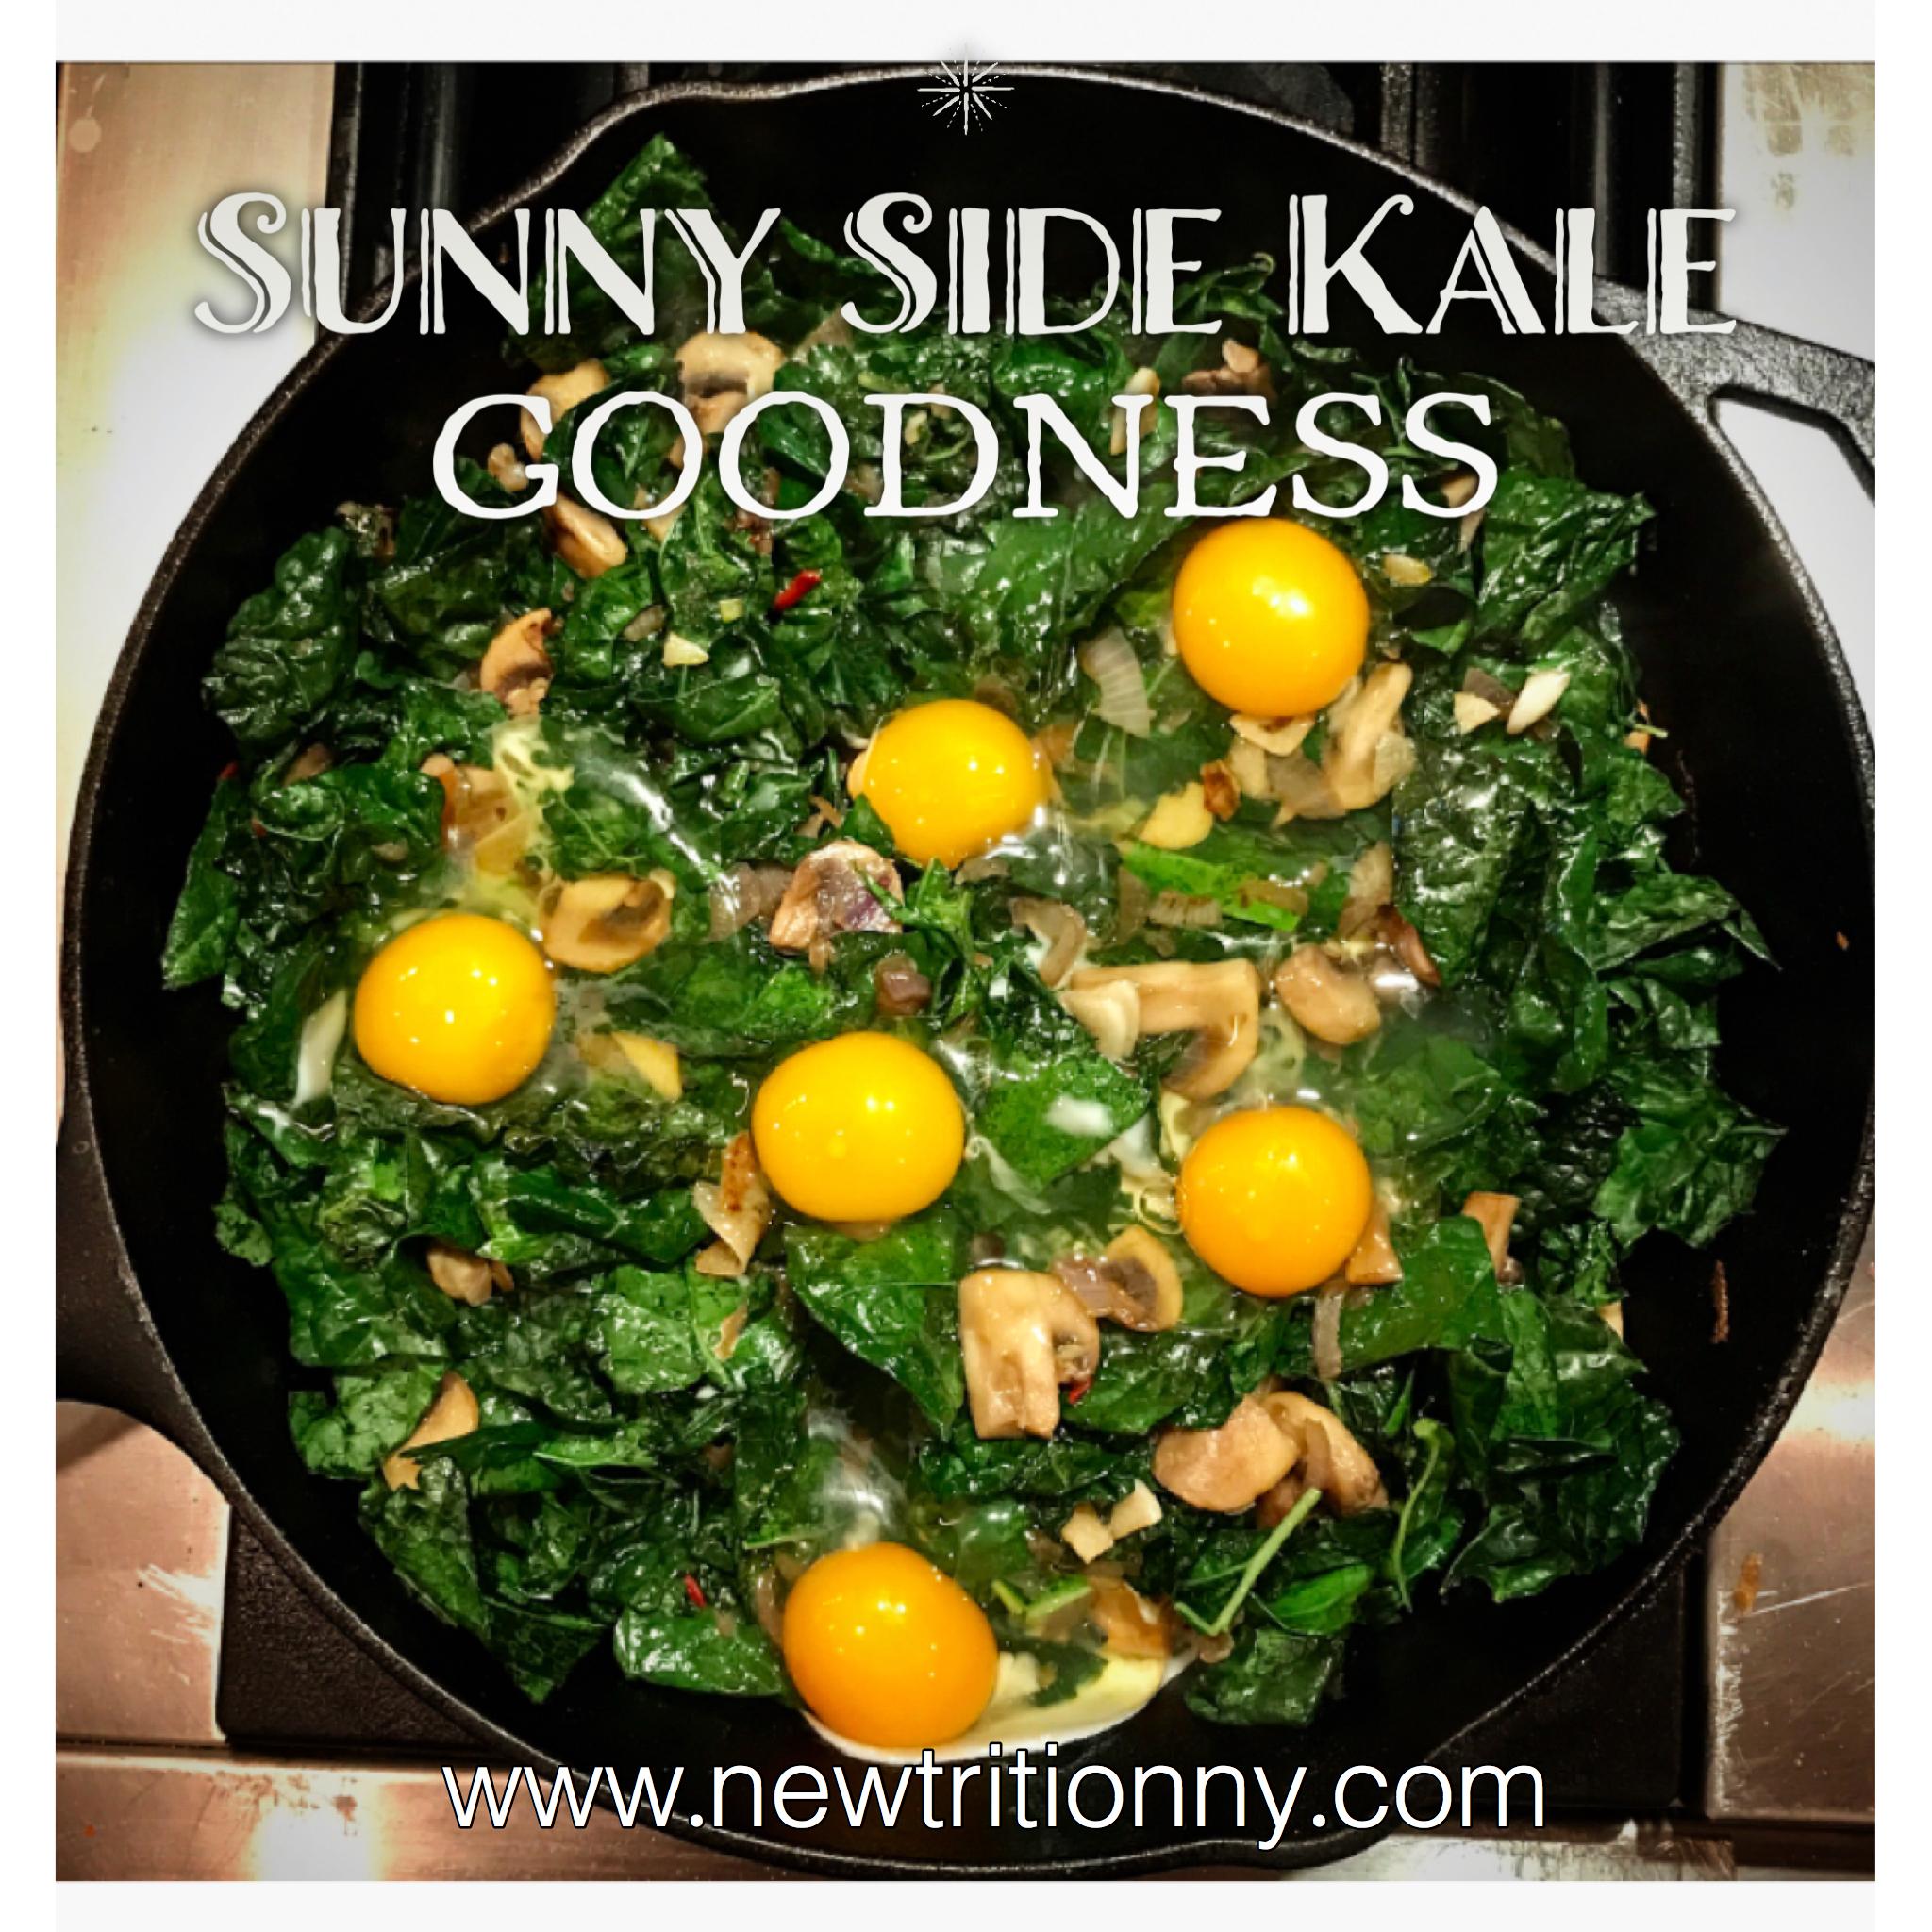 sunny side kale goodness - www.newtritionny.com